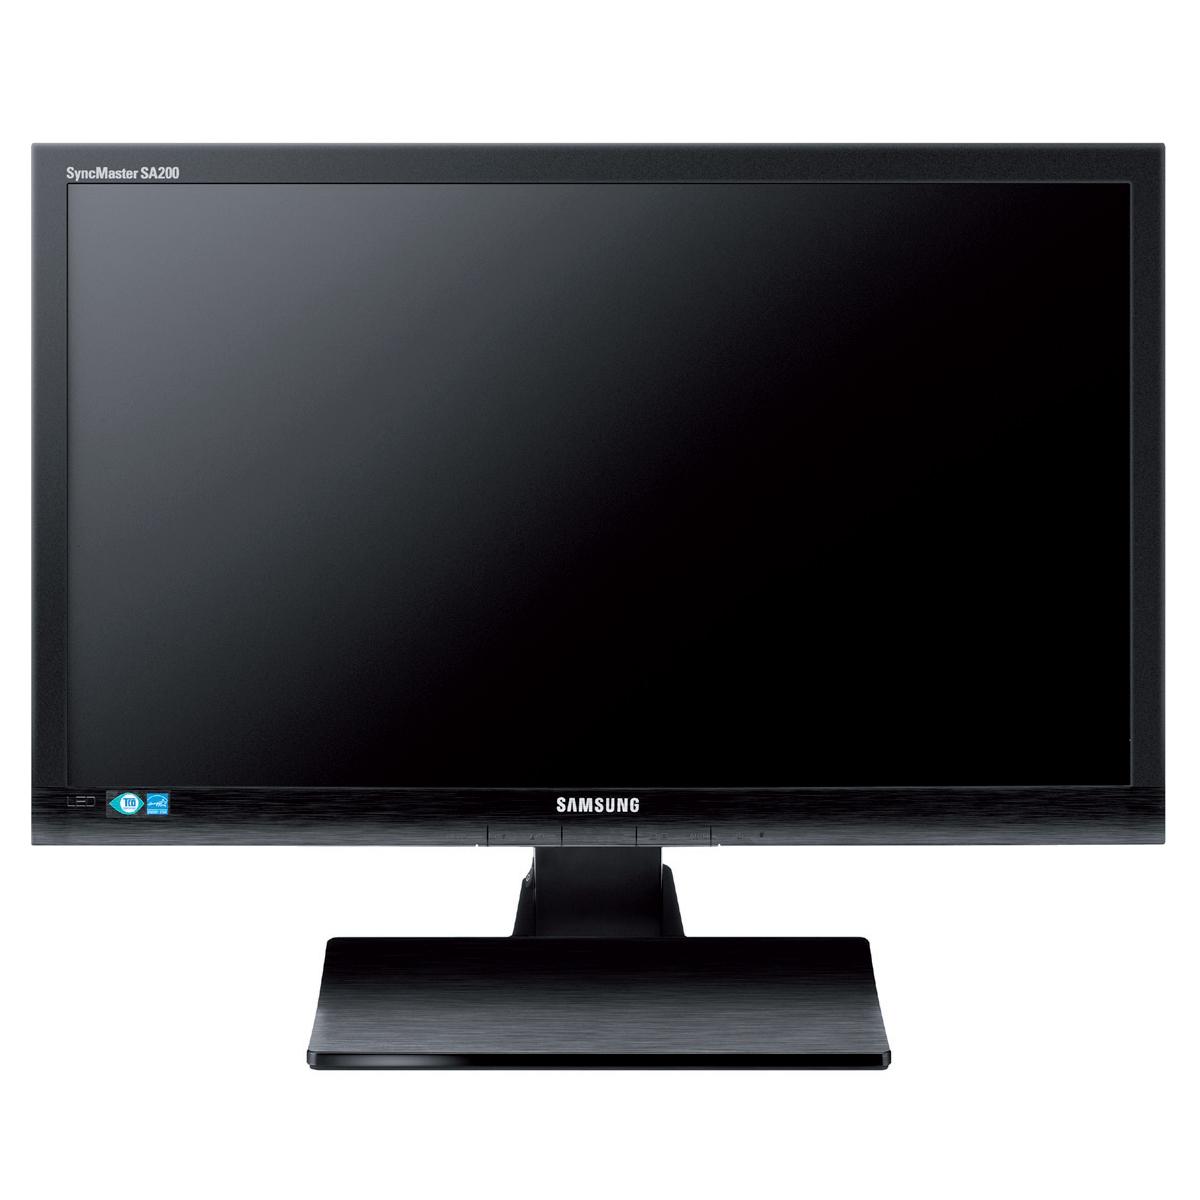 Samsung 22 led s22a450mw ls22a450mwu en achat for Vente ecran pc